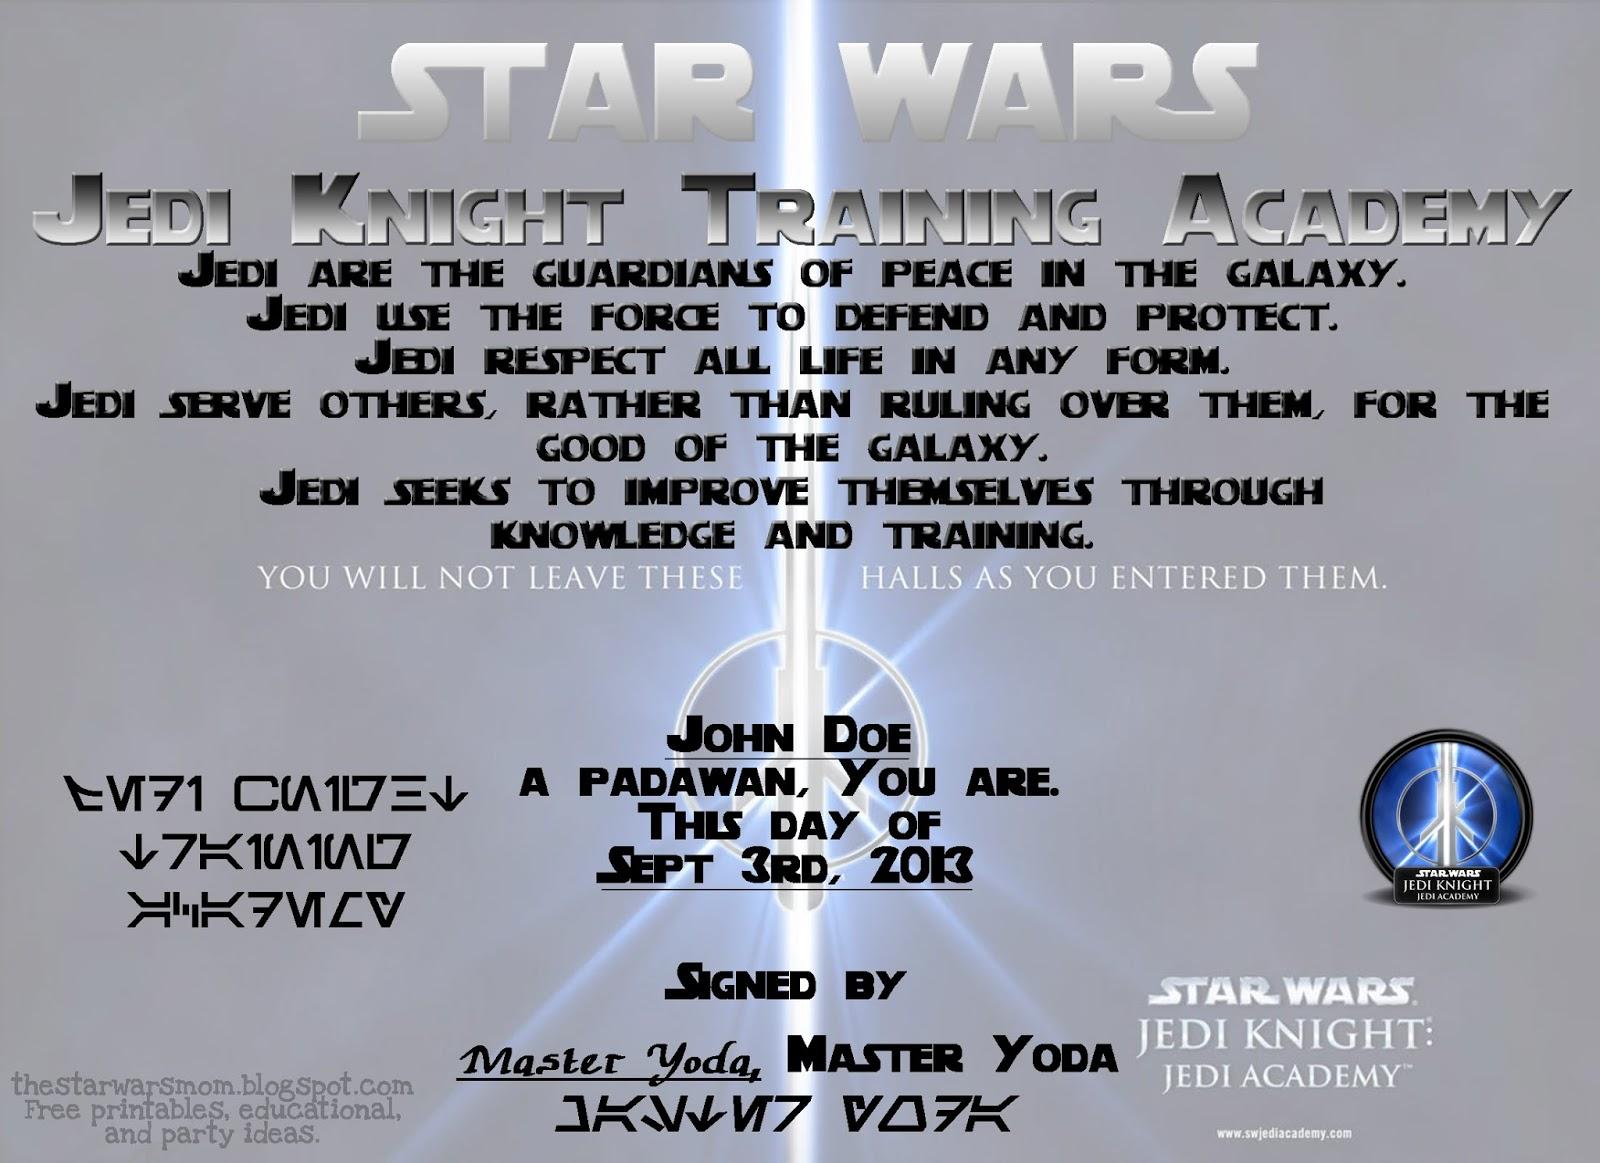 Star Wars - Jedi Knight Training Academy Certificate - Free